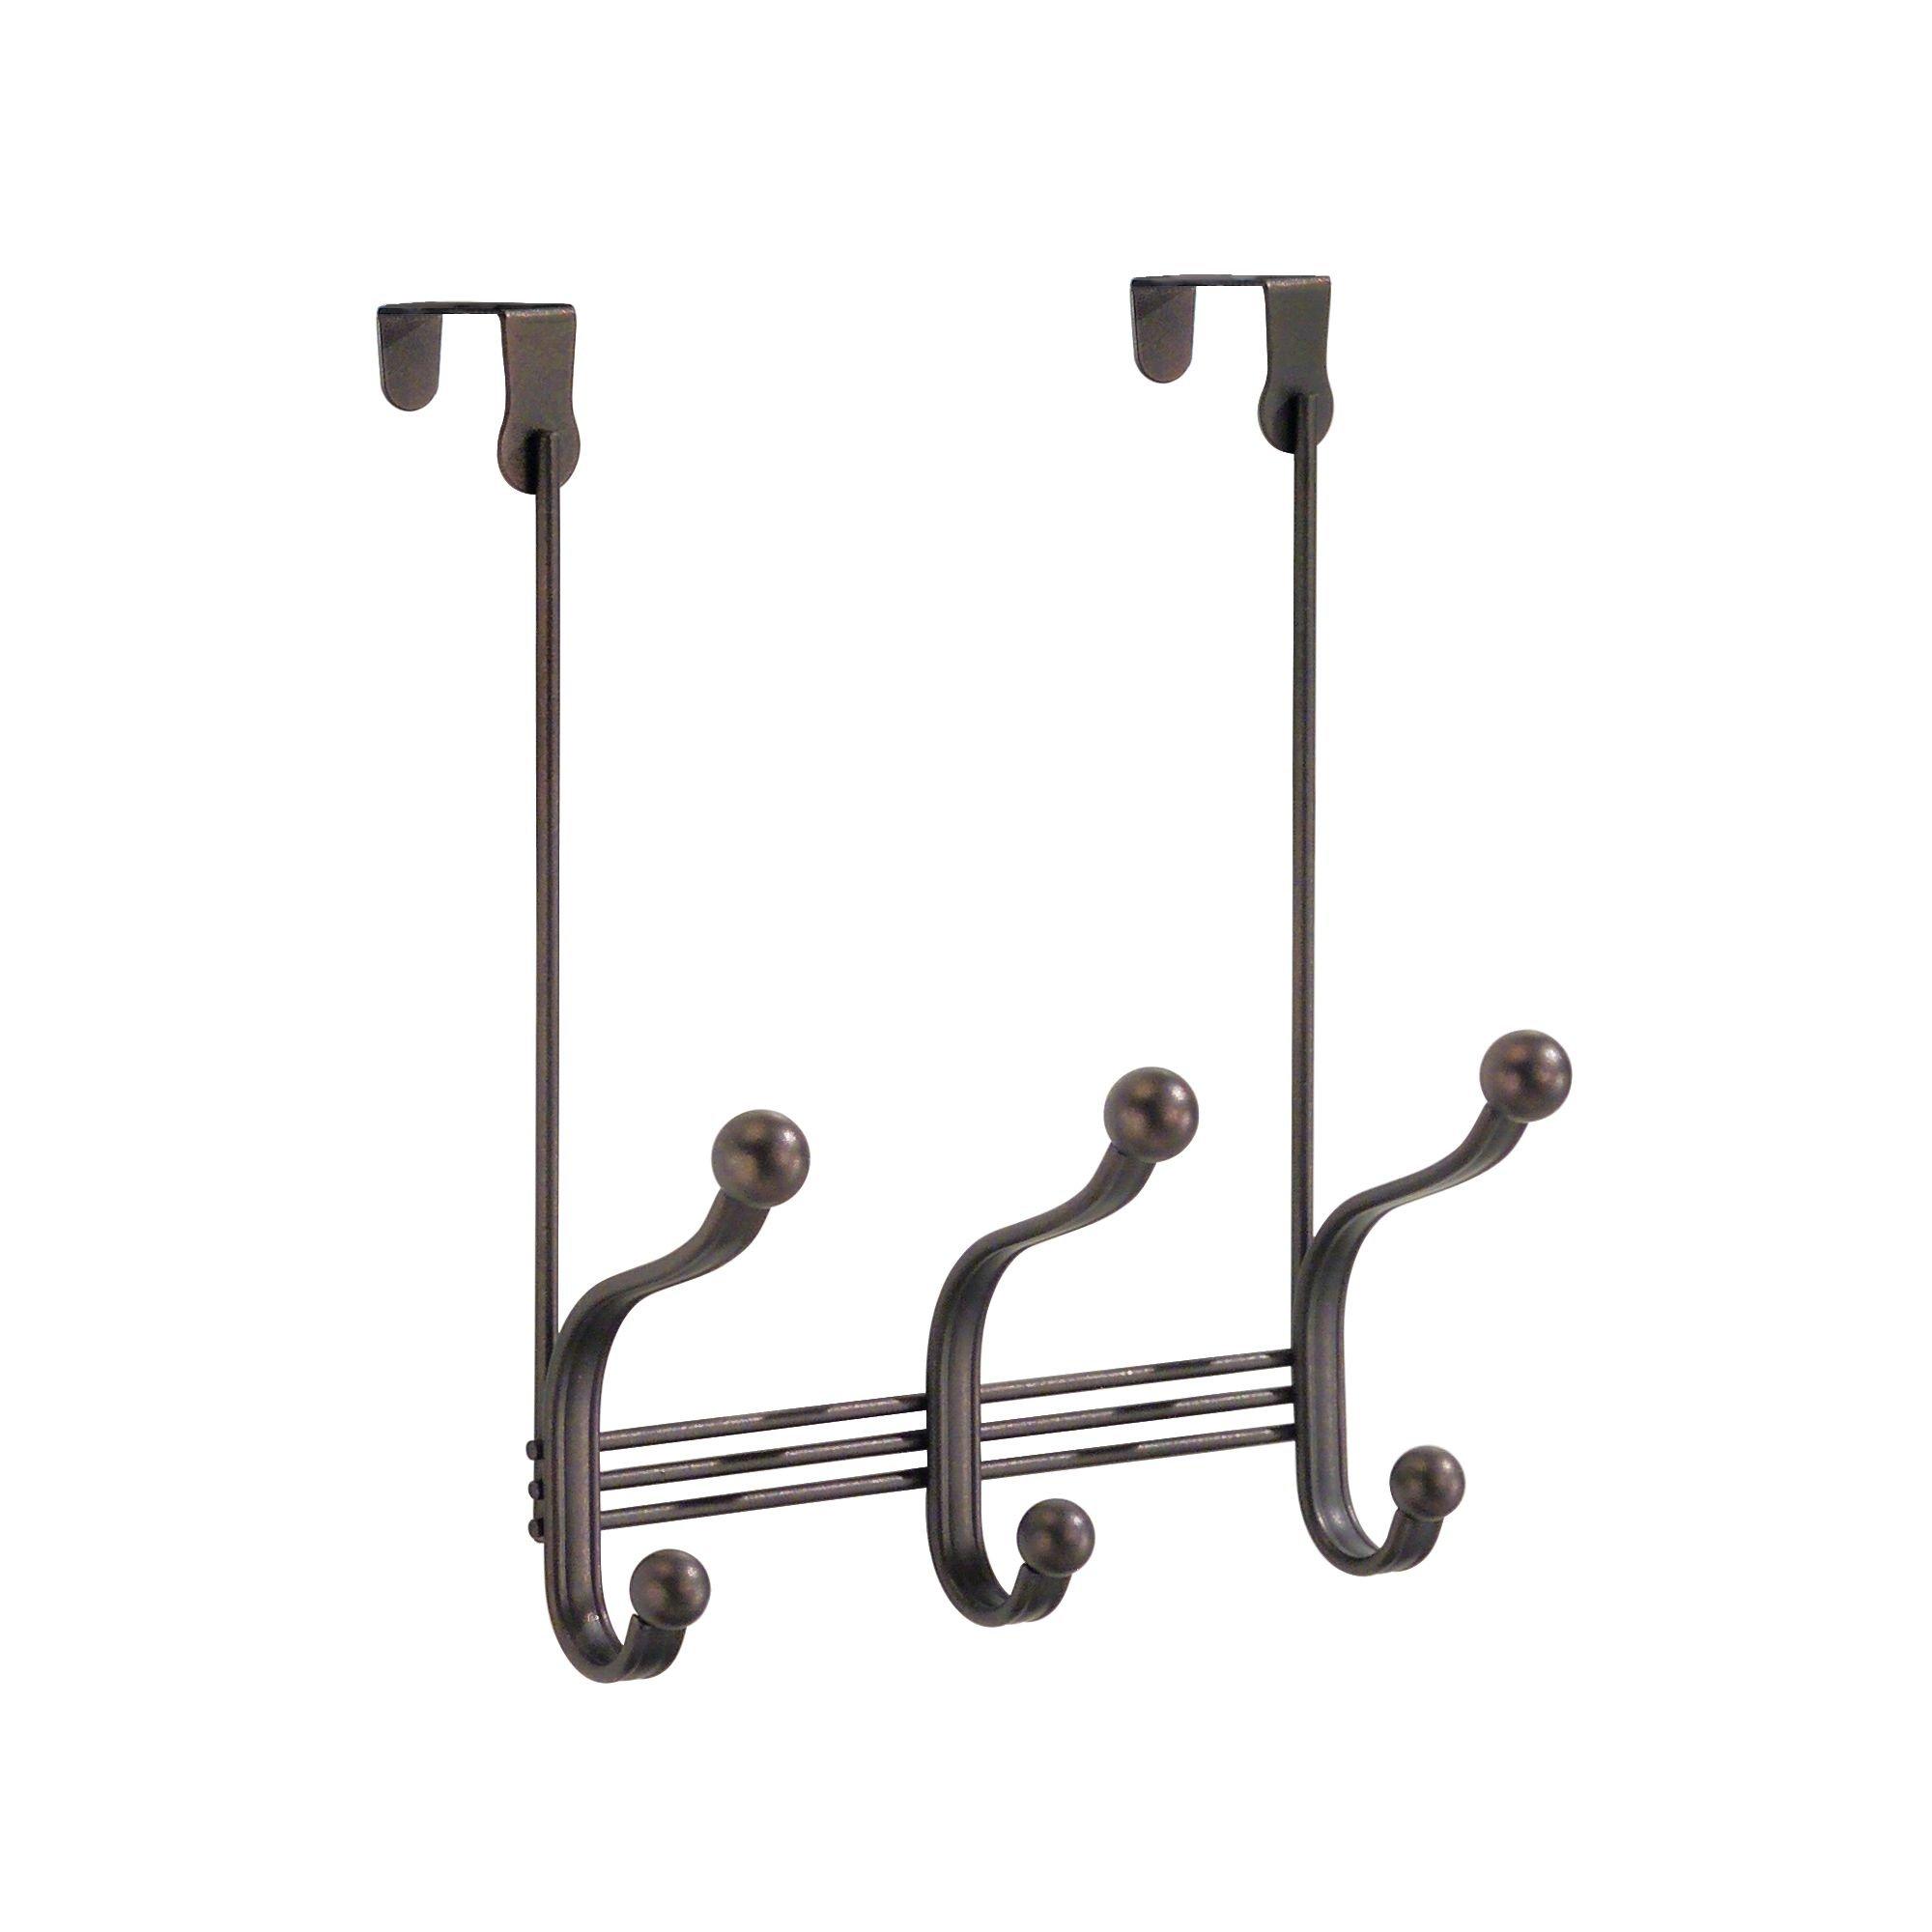 InterDesign York Lyra Over The Door 3 Dual-Hook Storage Rack for Coats, Hats, Robes, Towels – Pack of 2, Bronze product image